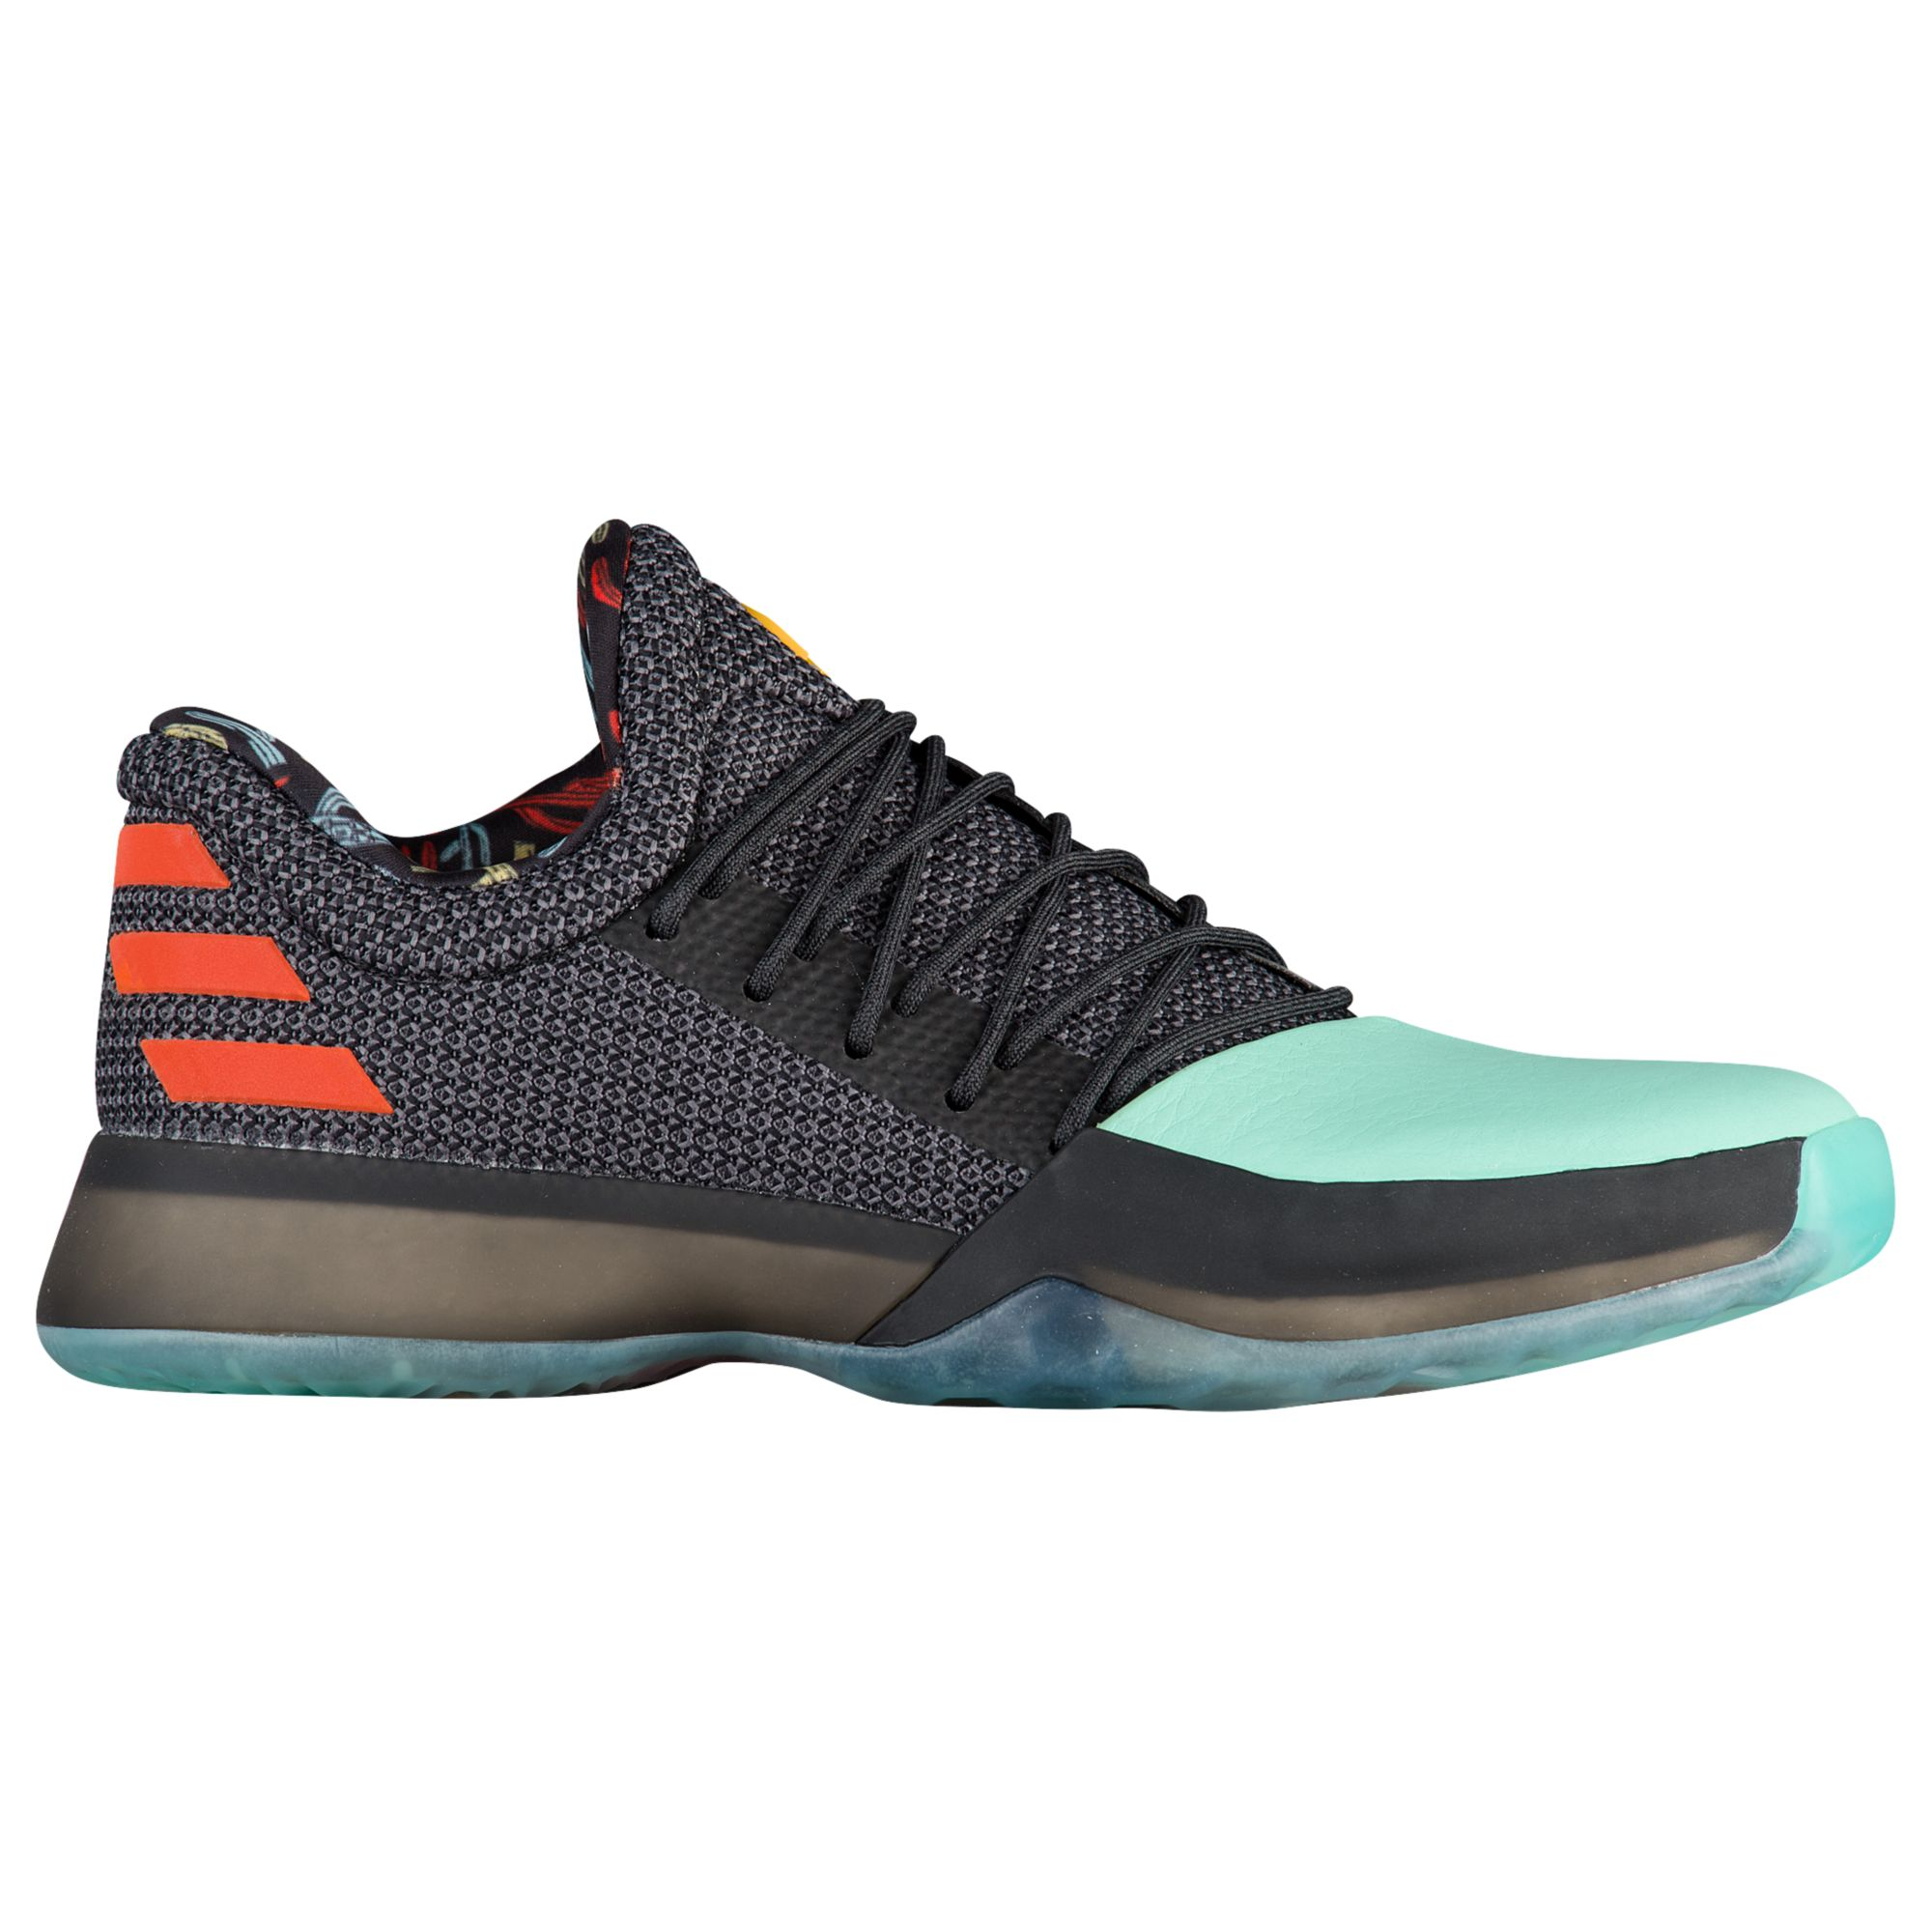 Chaussure de Basketball adidas James Harden Vol.1 Yacht Club